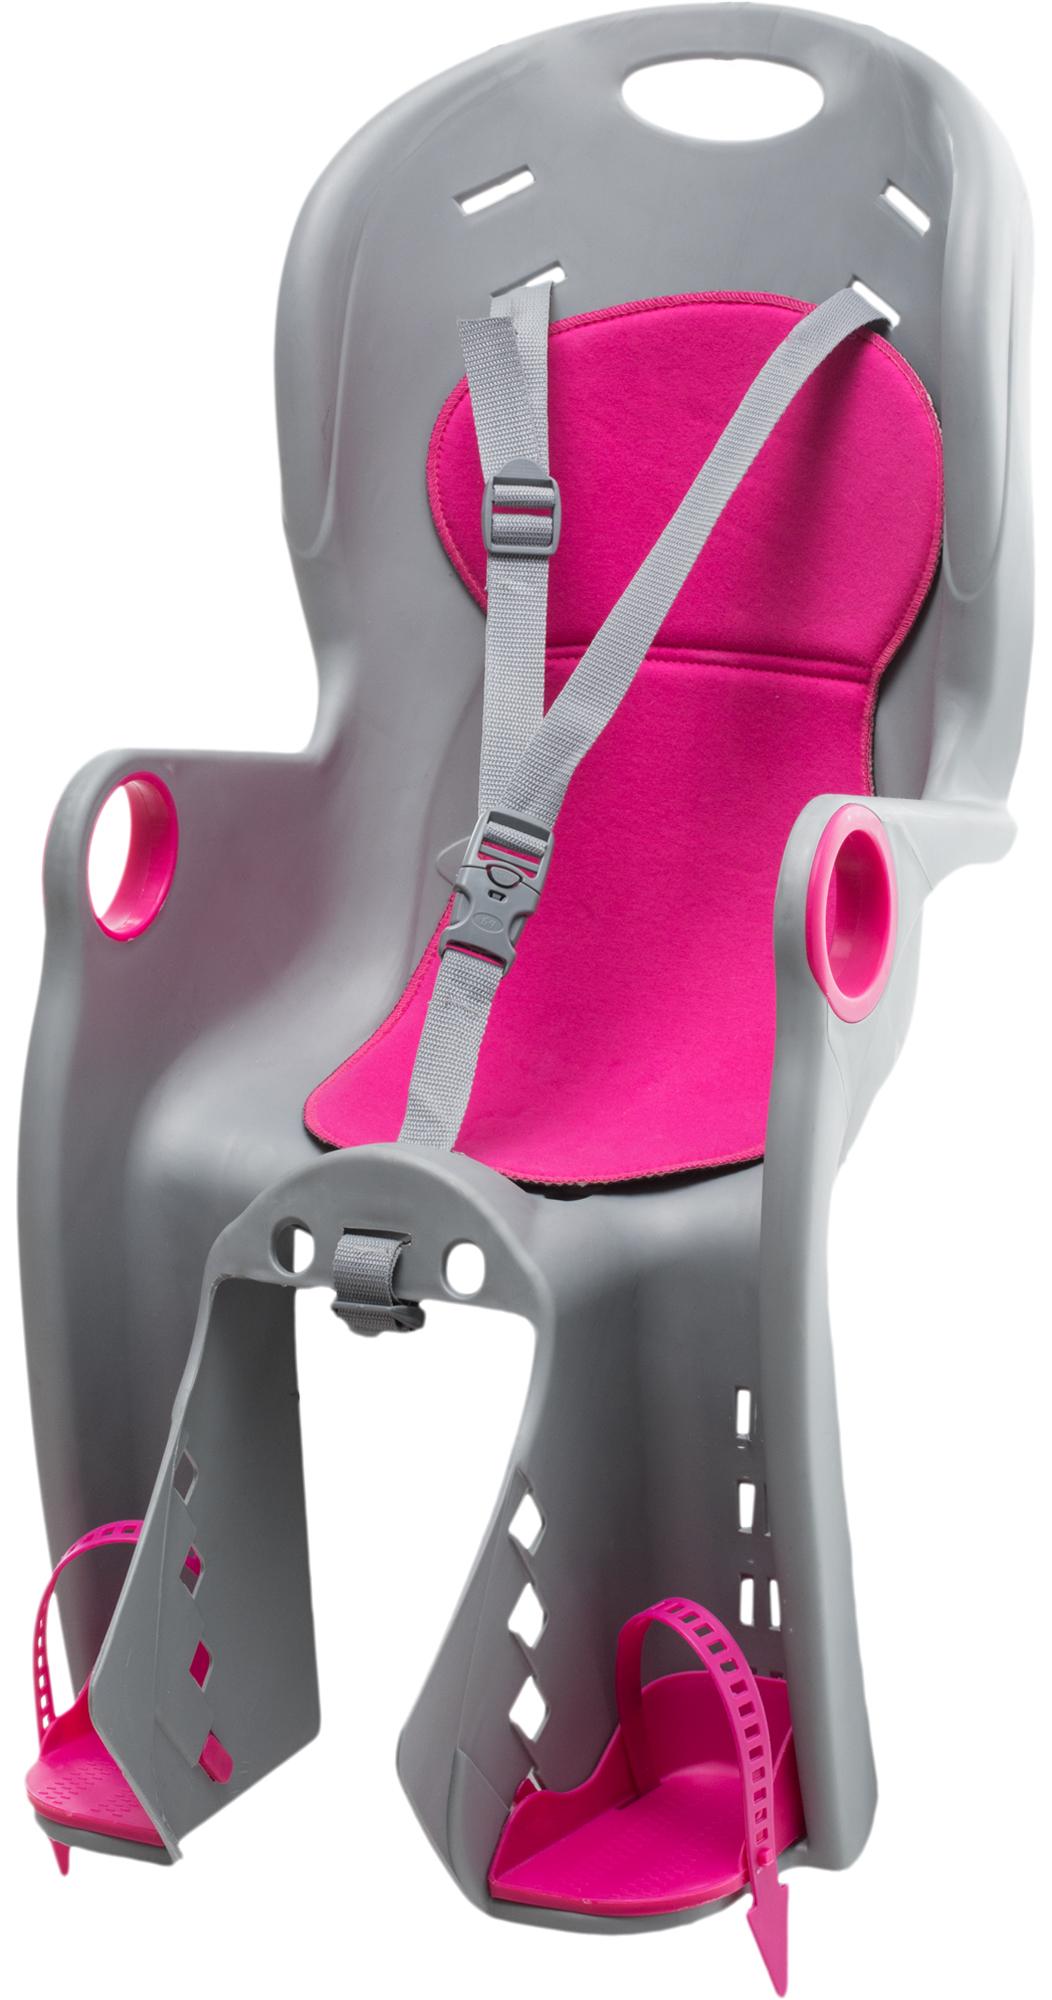 Cyclotech Детское велокресло